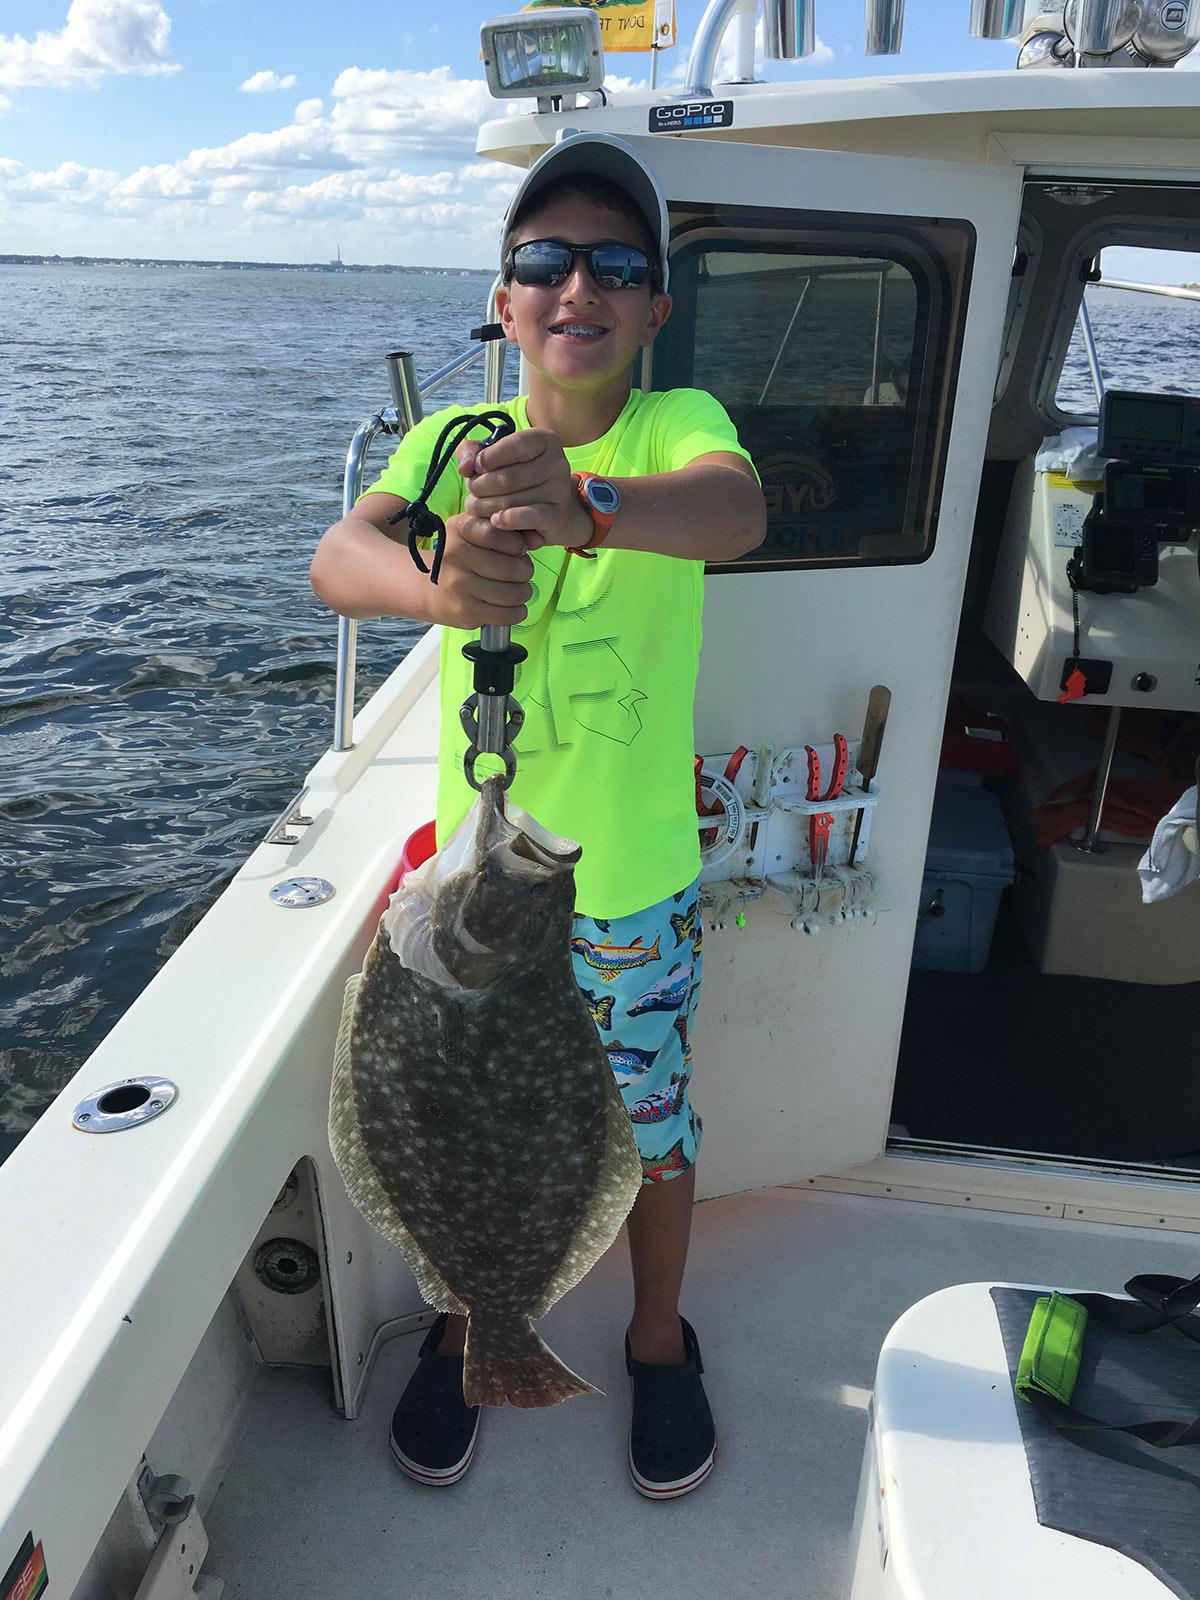 boy in neon shirt showing off the fluke fish he caught